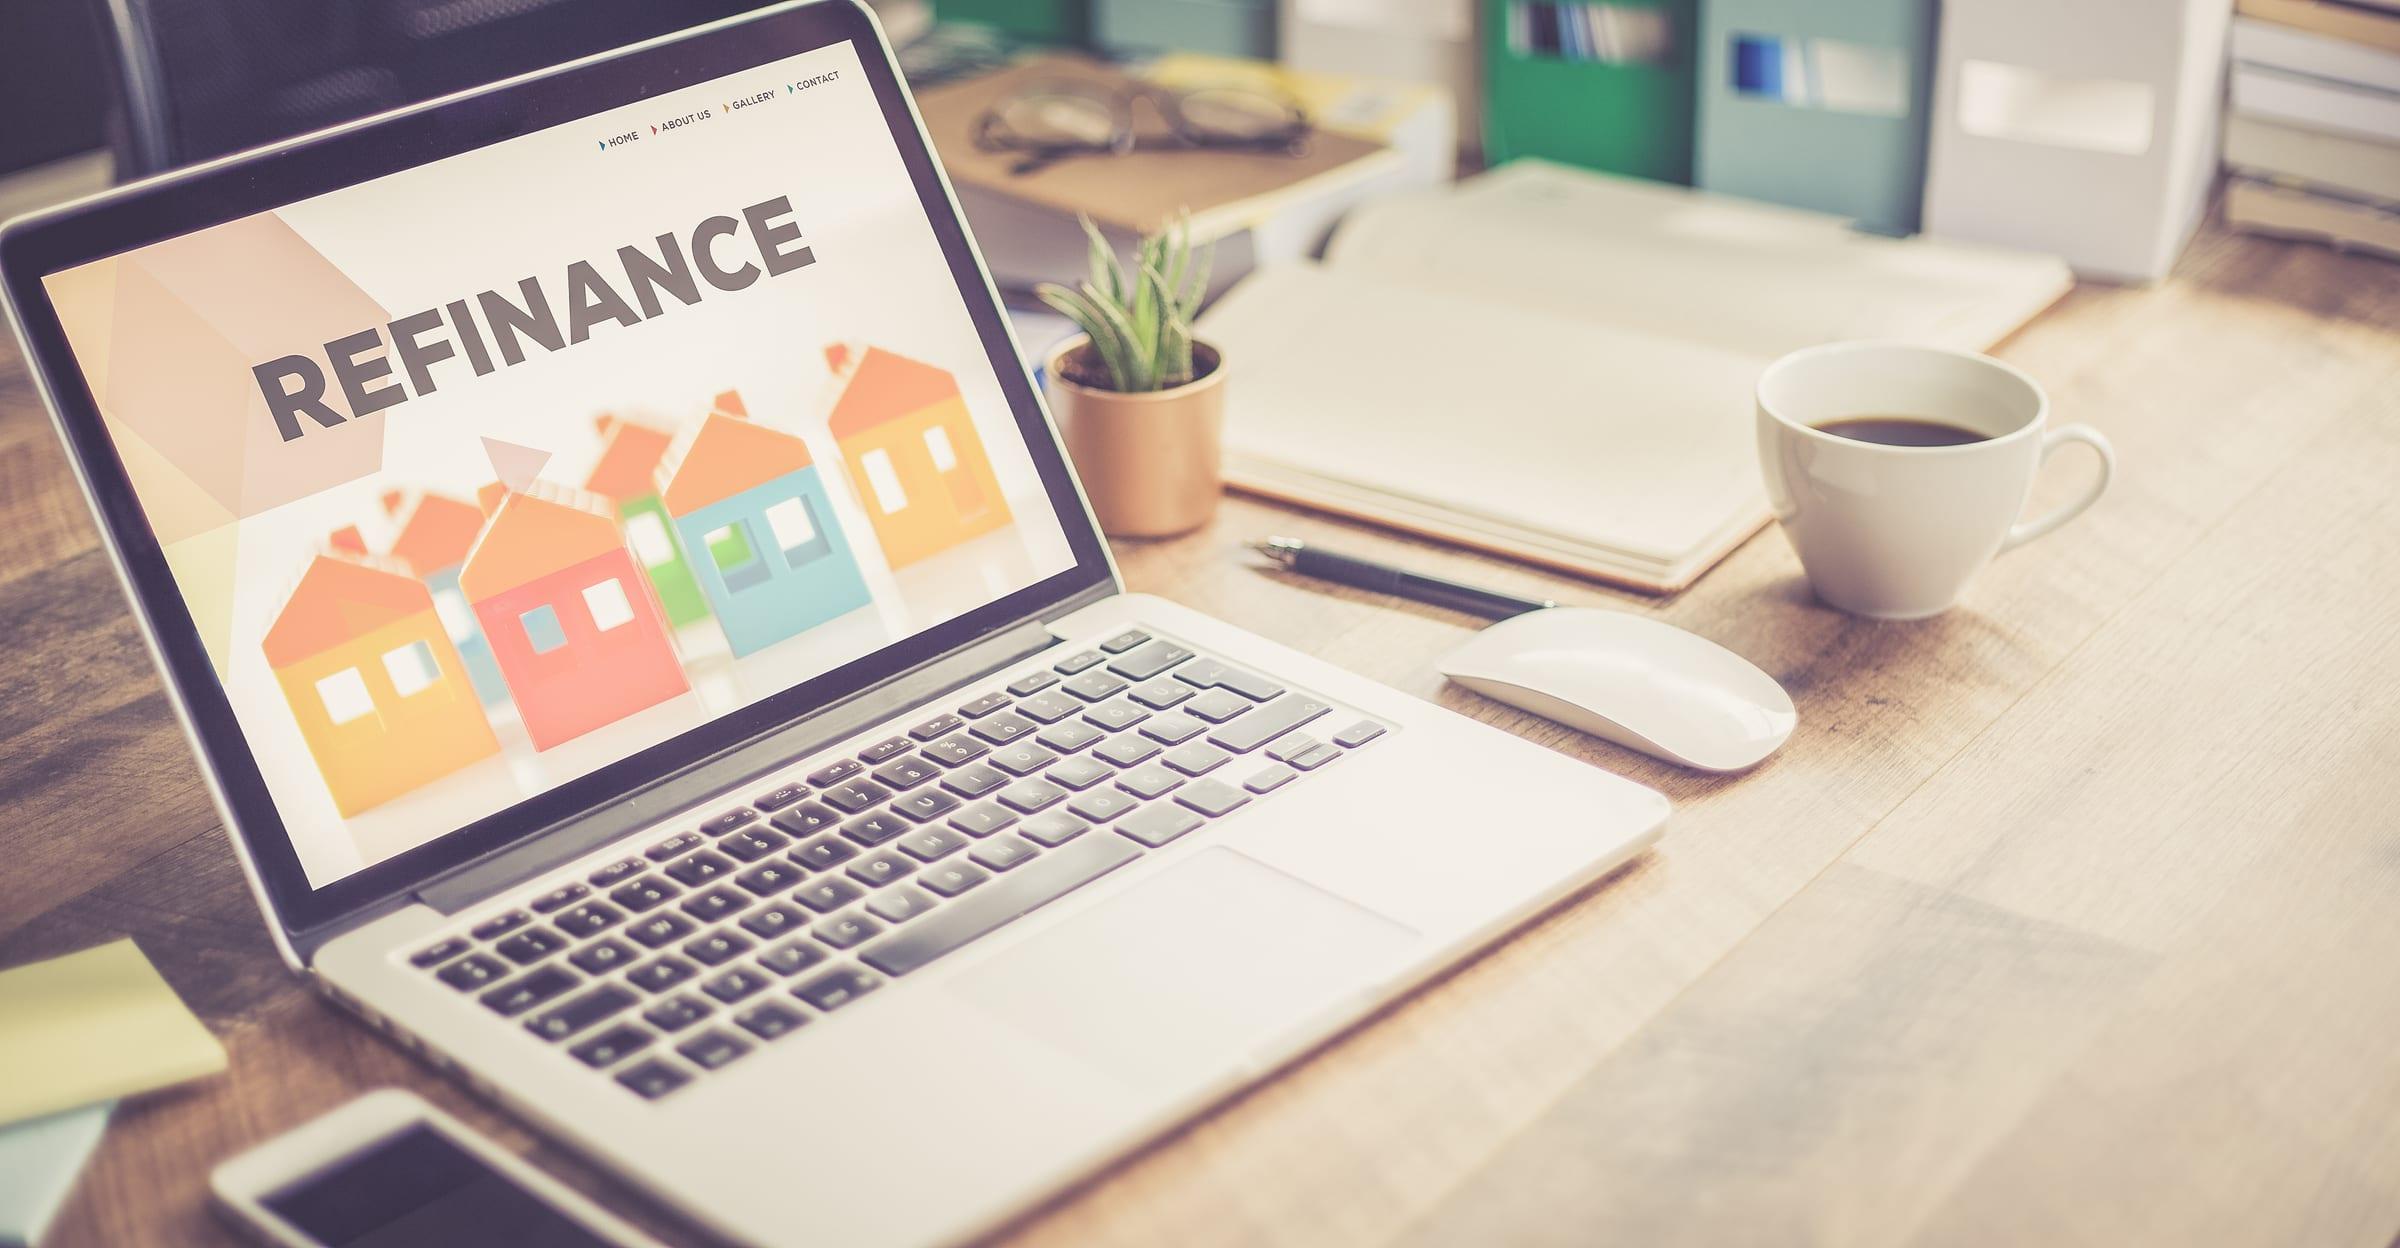 refinance graphic